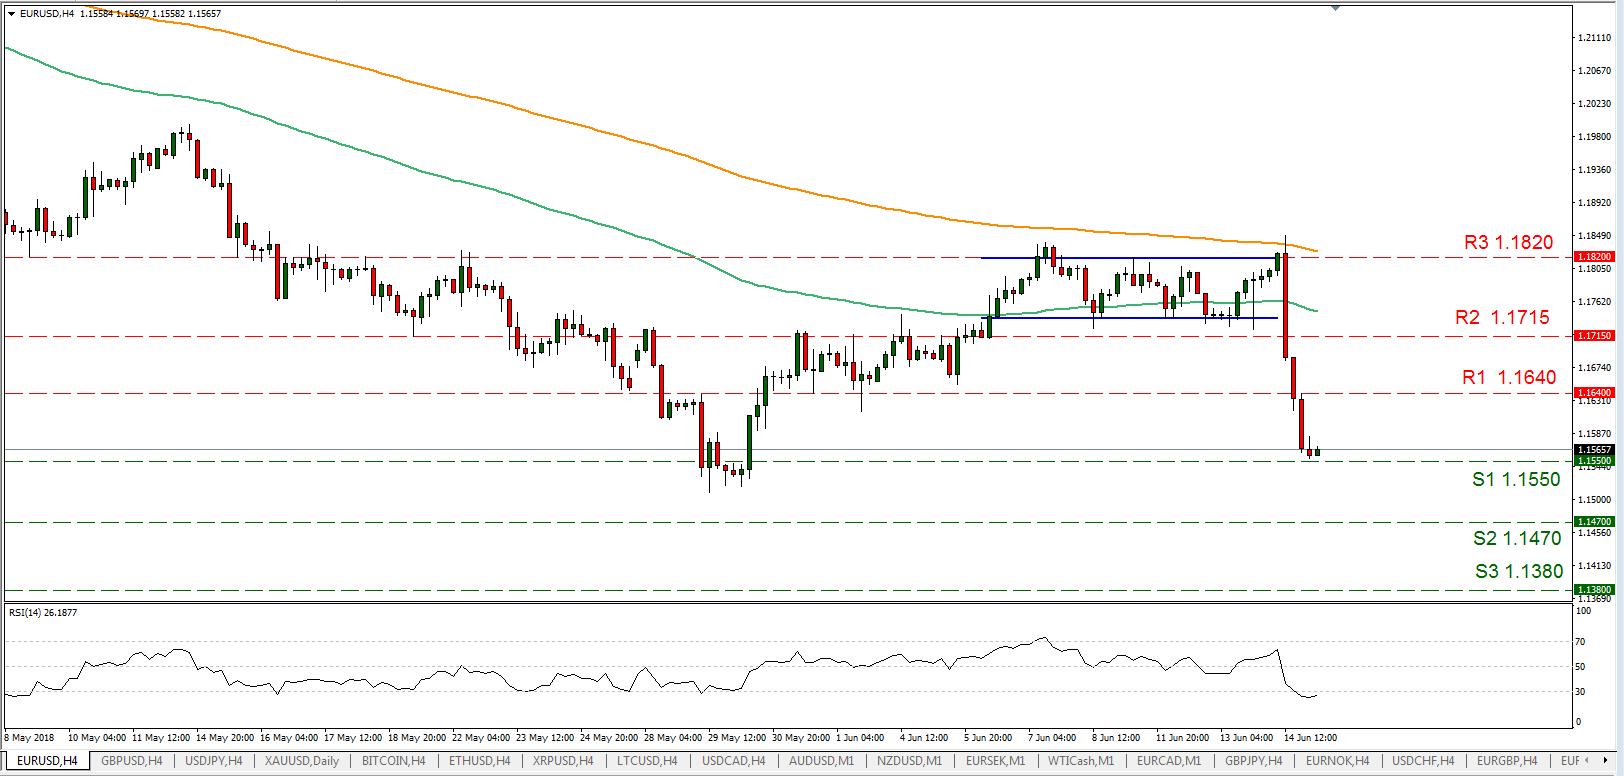 EUR/USD 15/06/2018 | EconAlerts